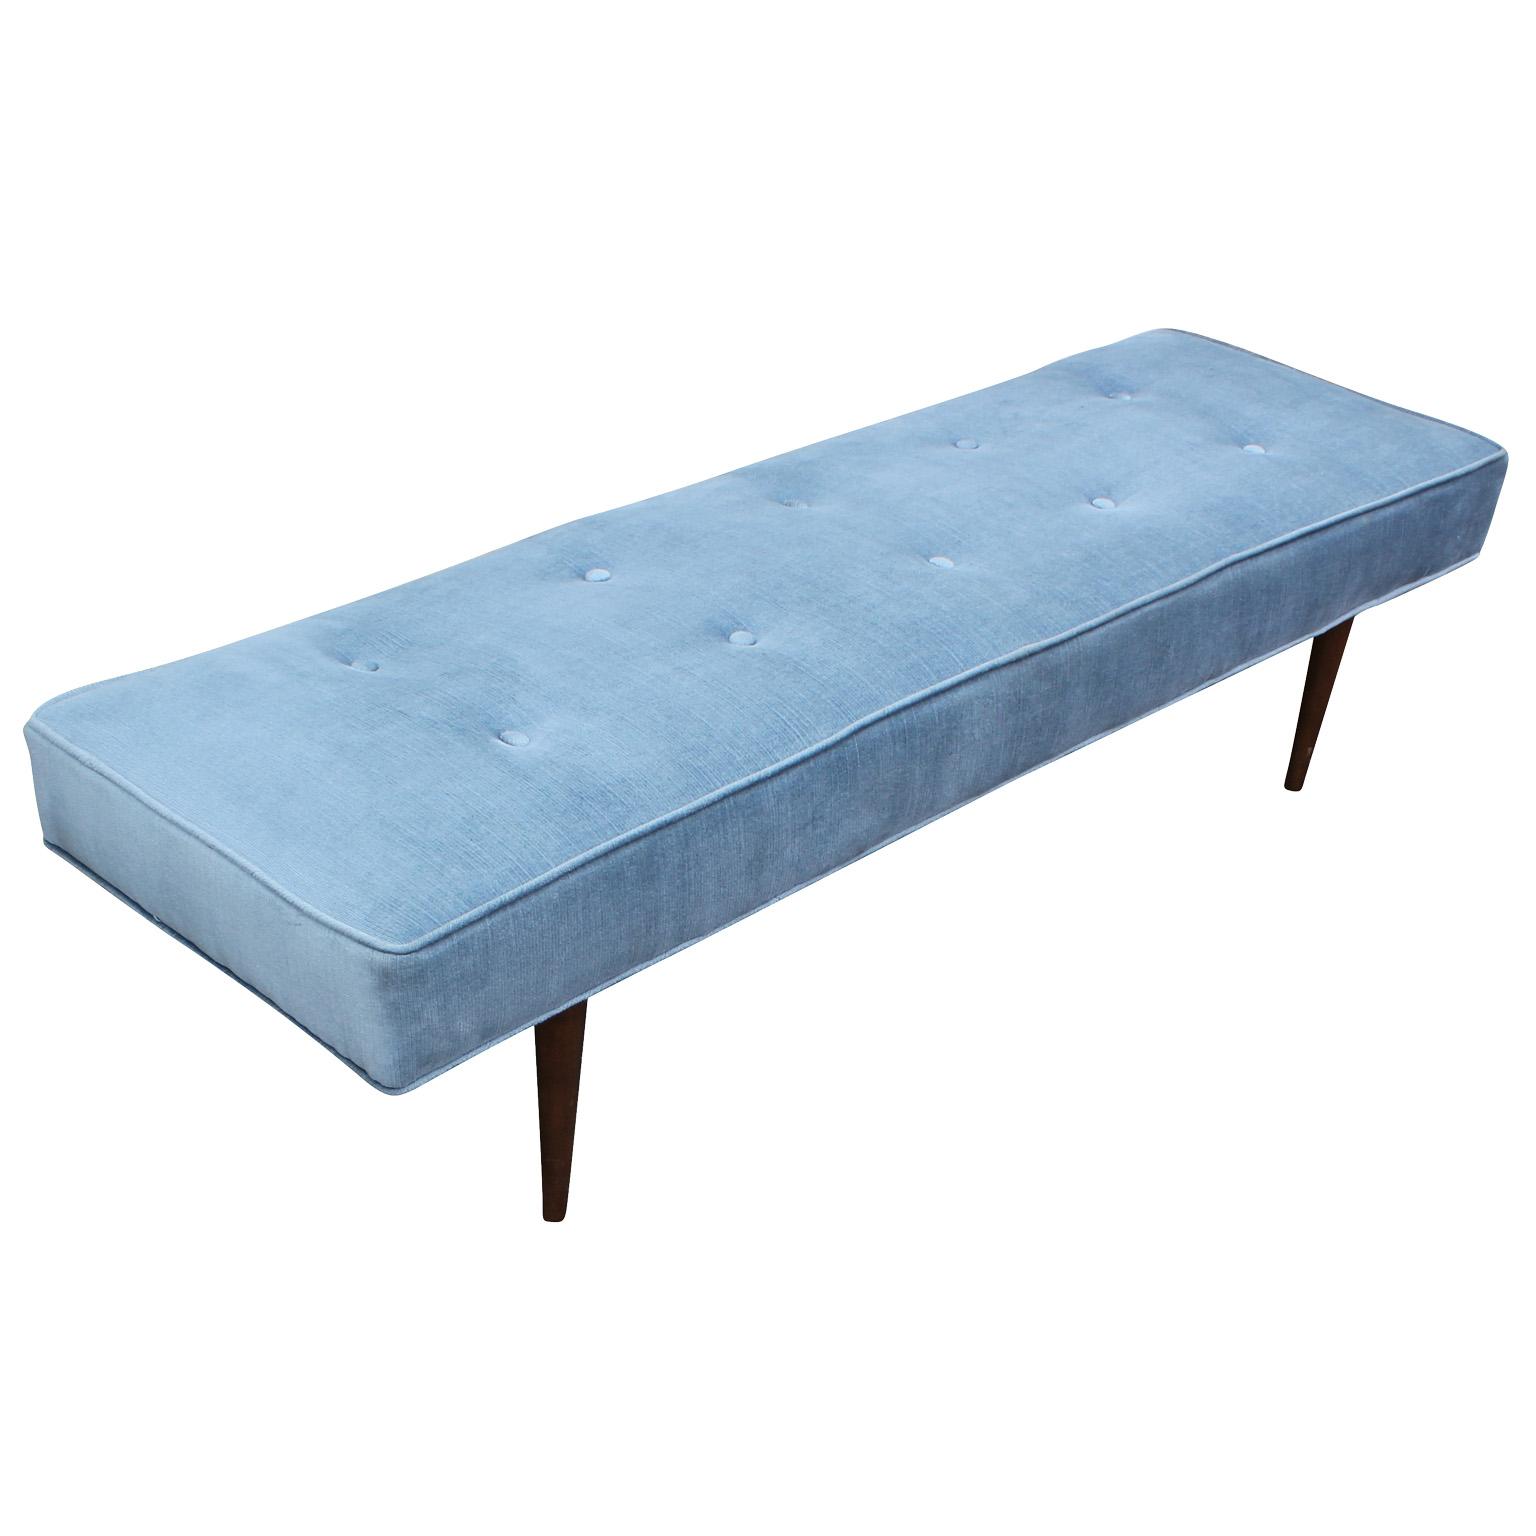 Elegant Milo Baughman Bench In Icy Blue Velvet